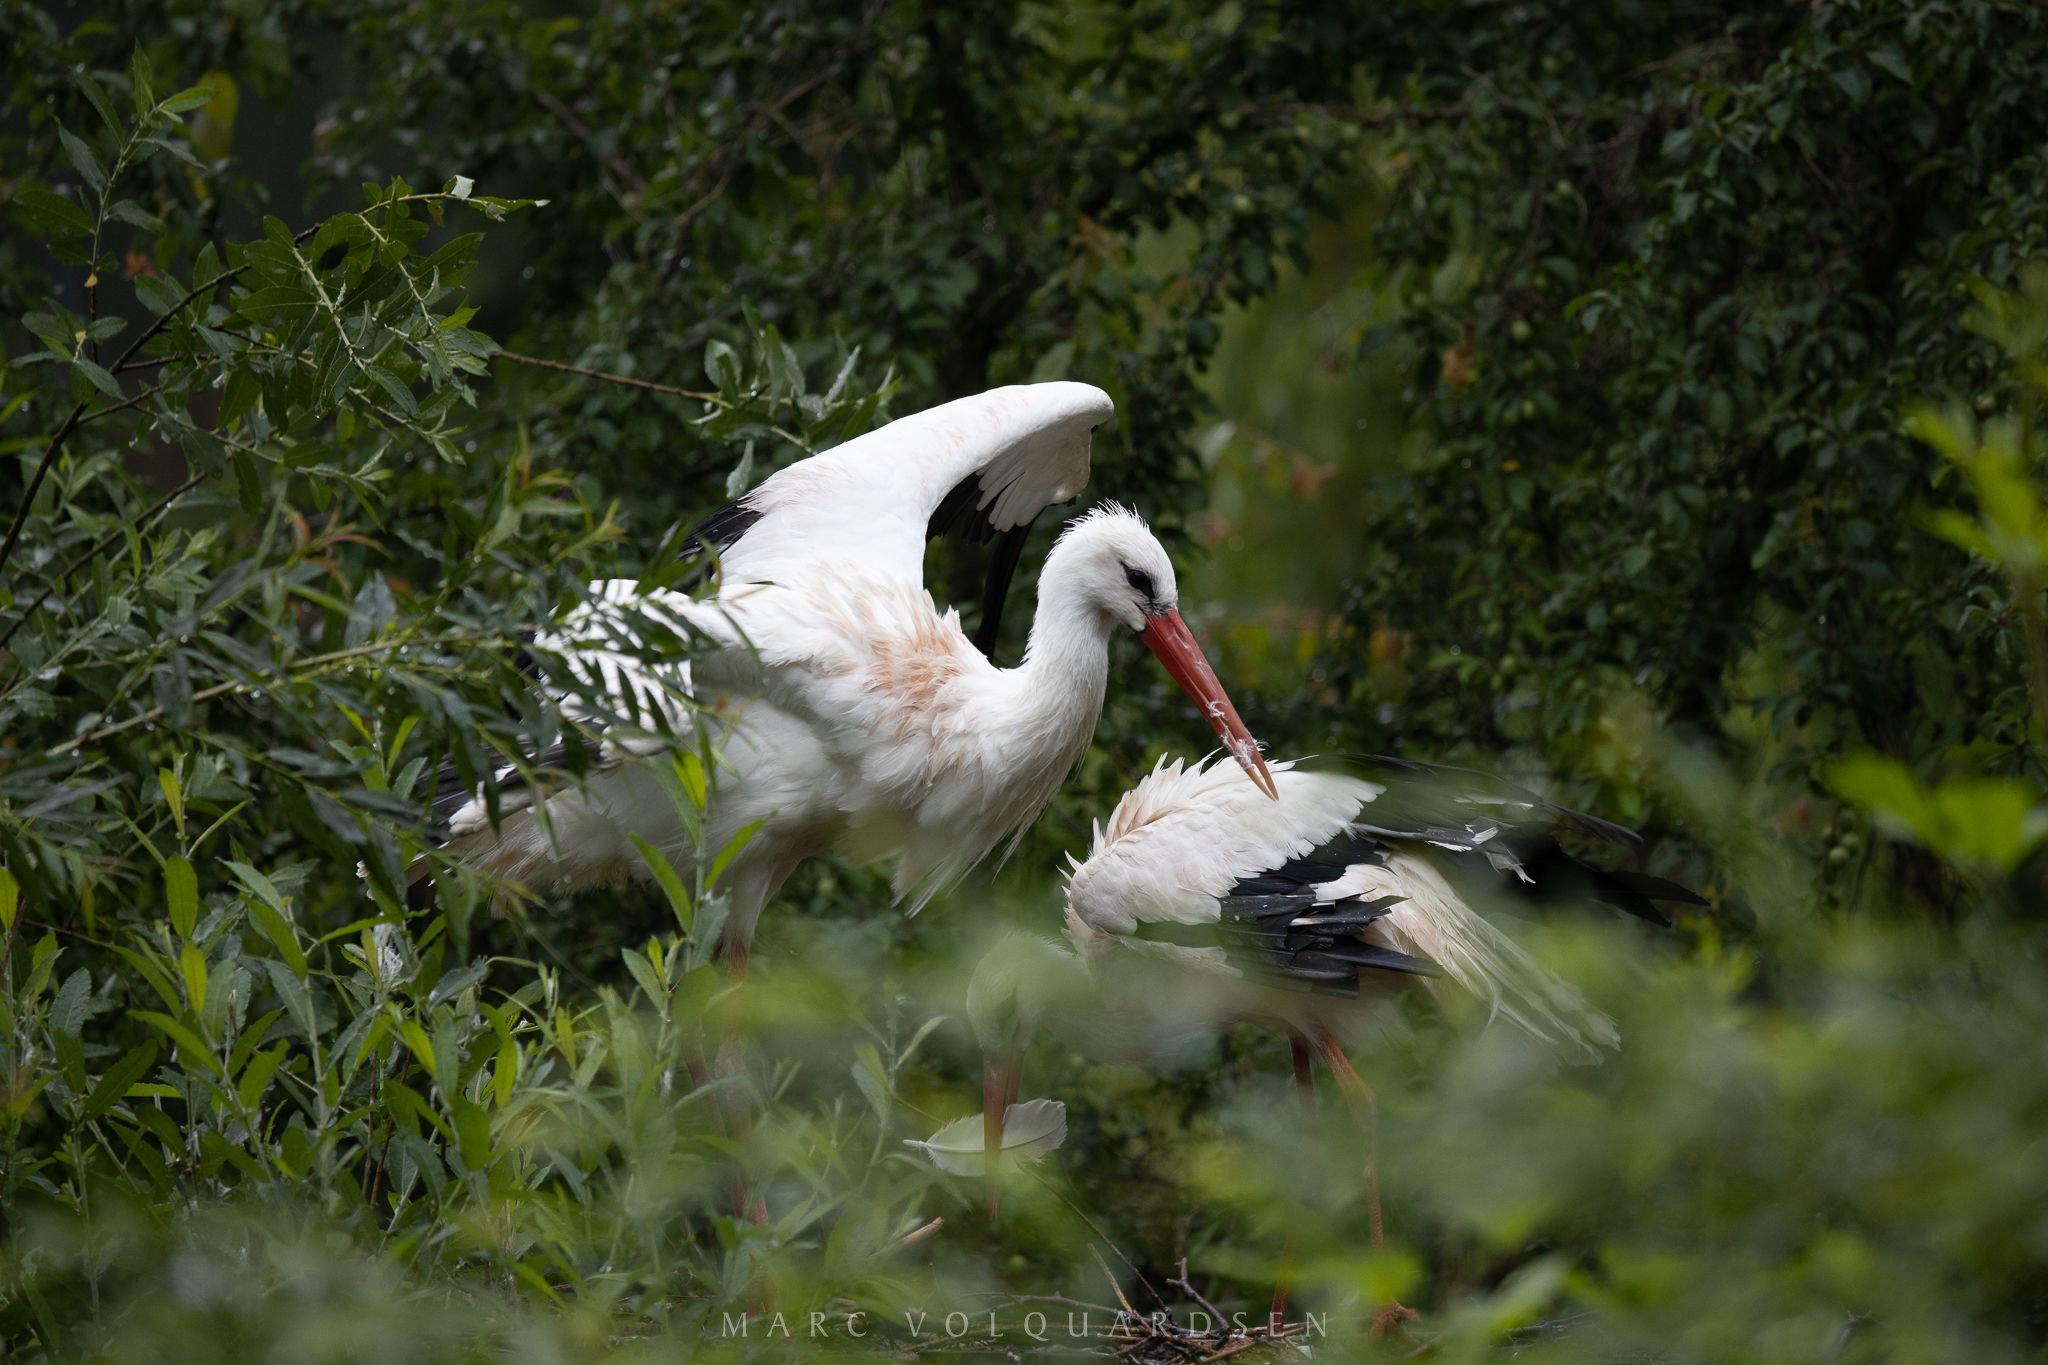 Storks in the nest (0127)